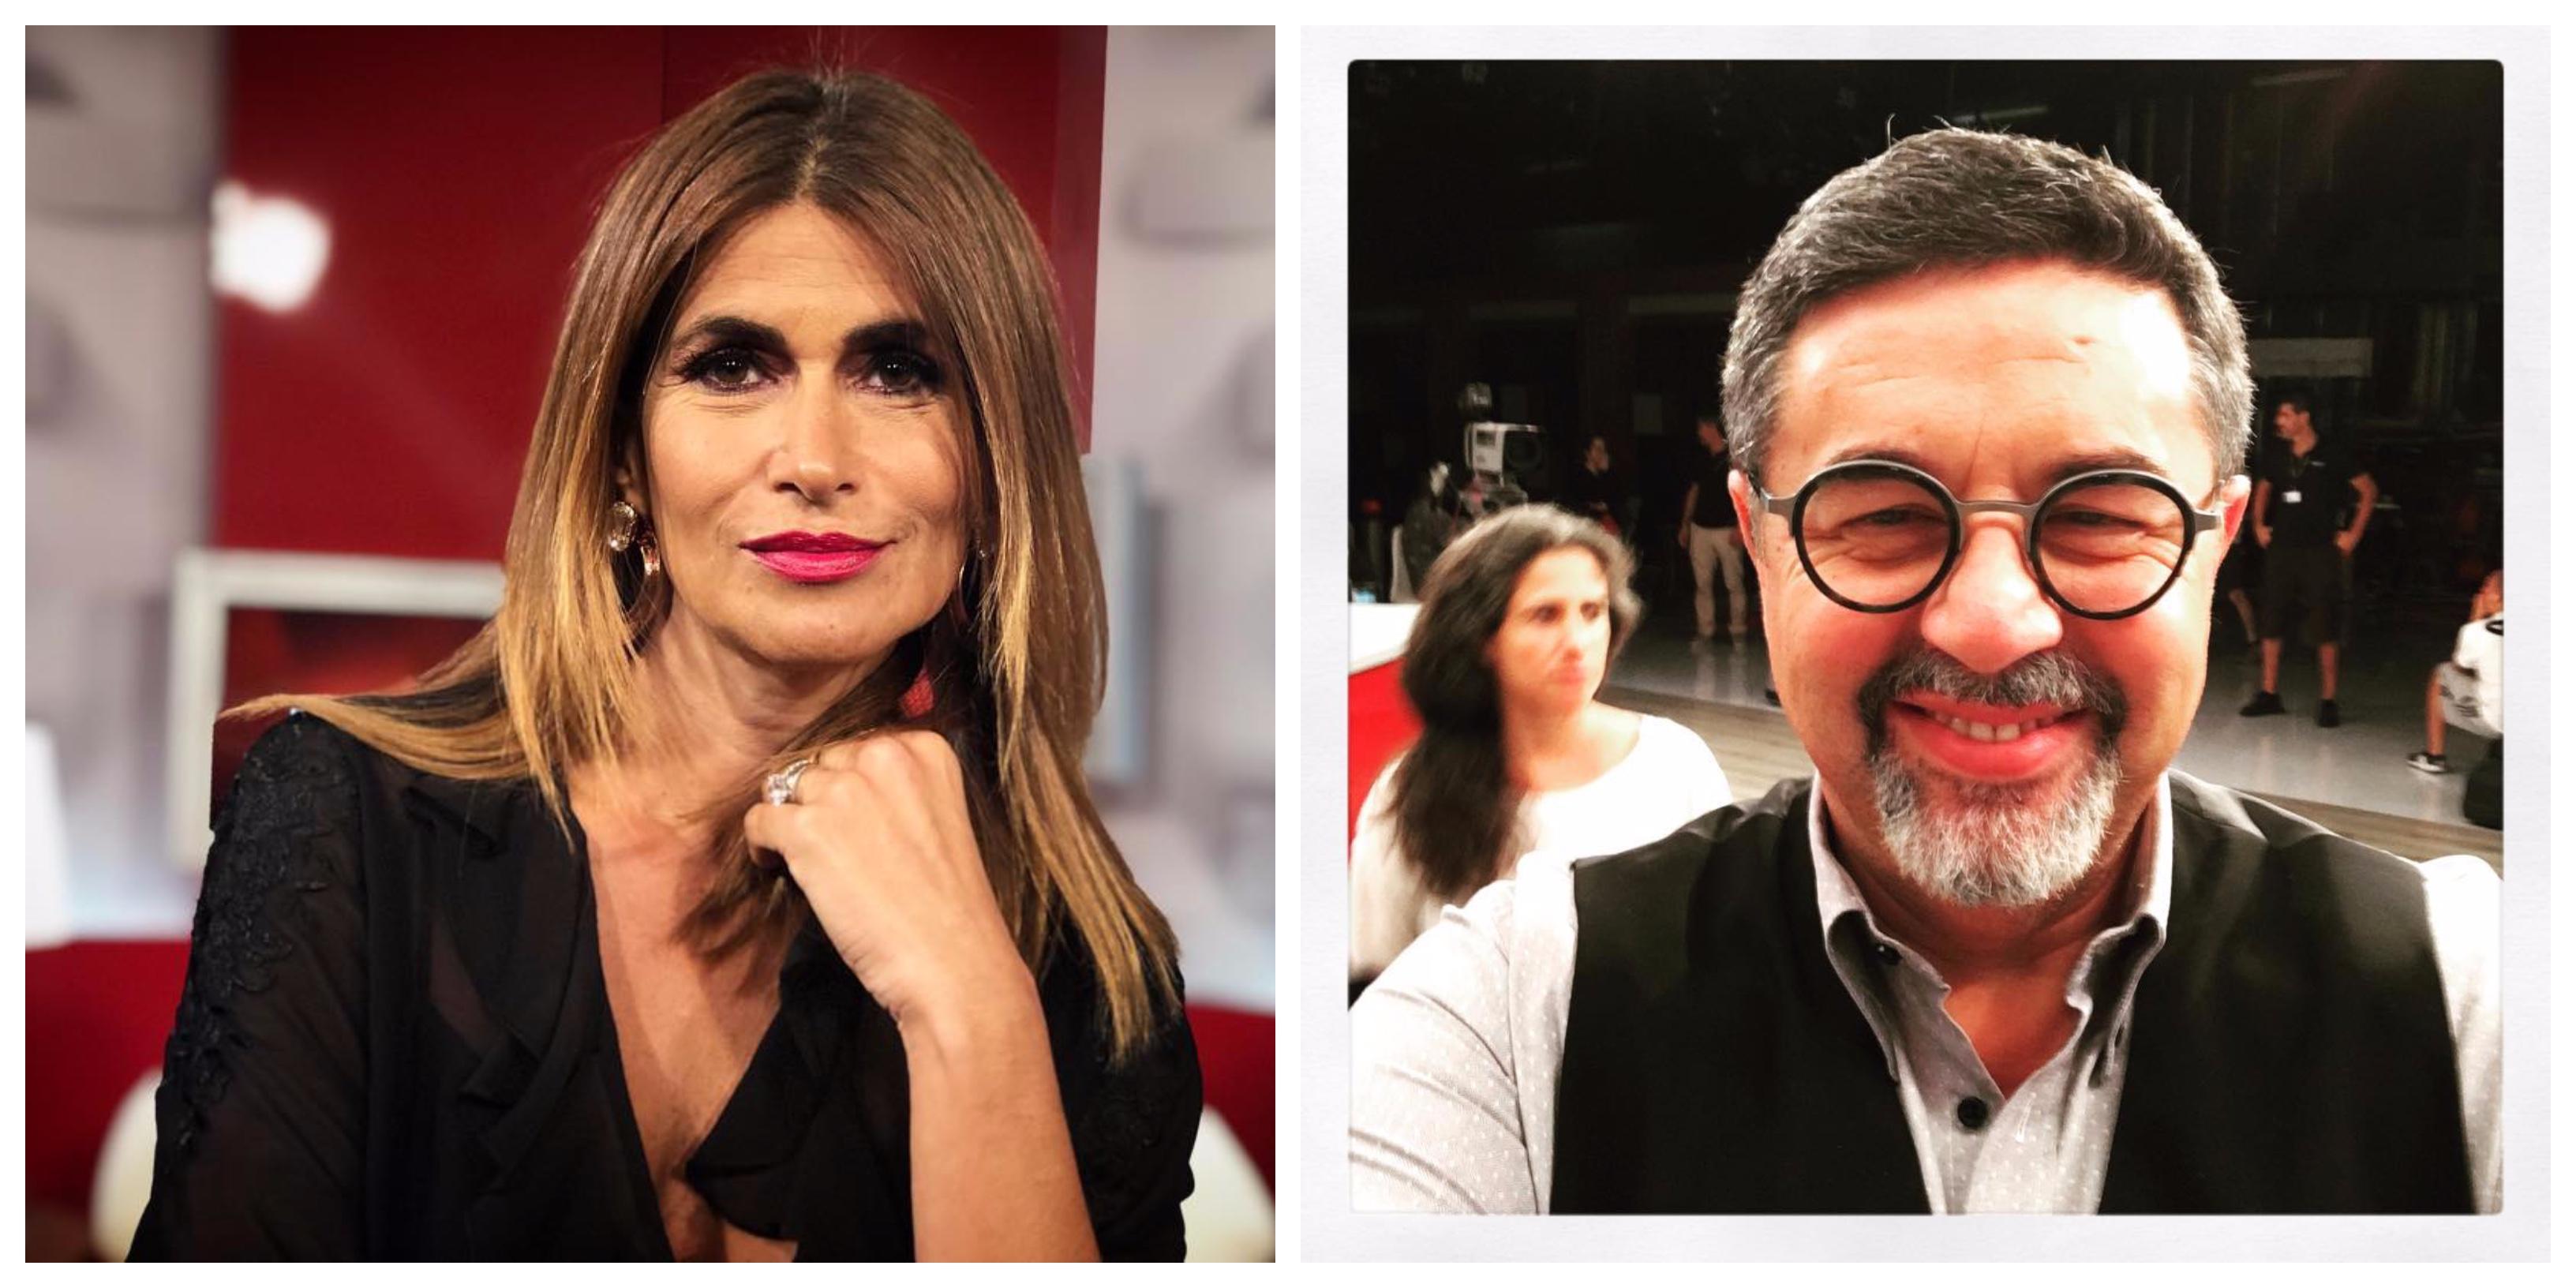 Liliana Campos Jose Carlos Malato